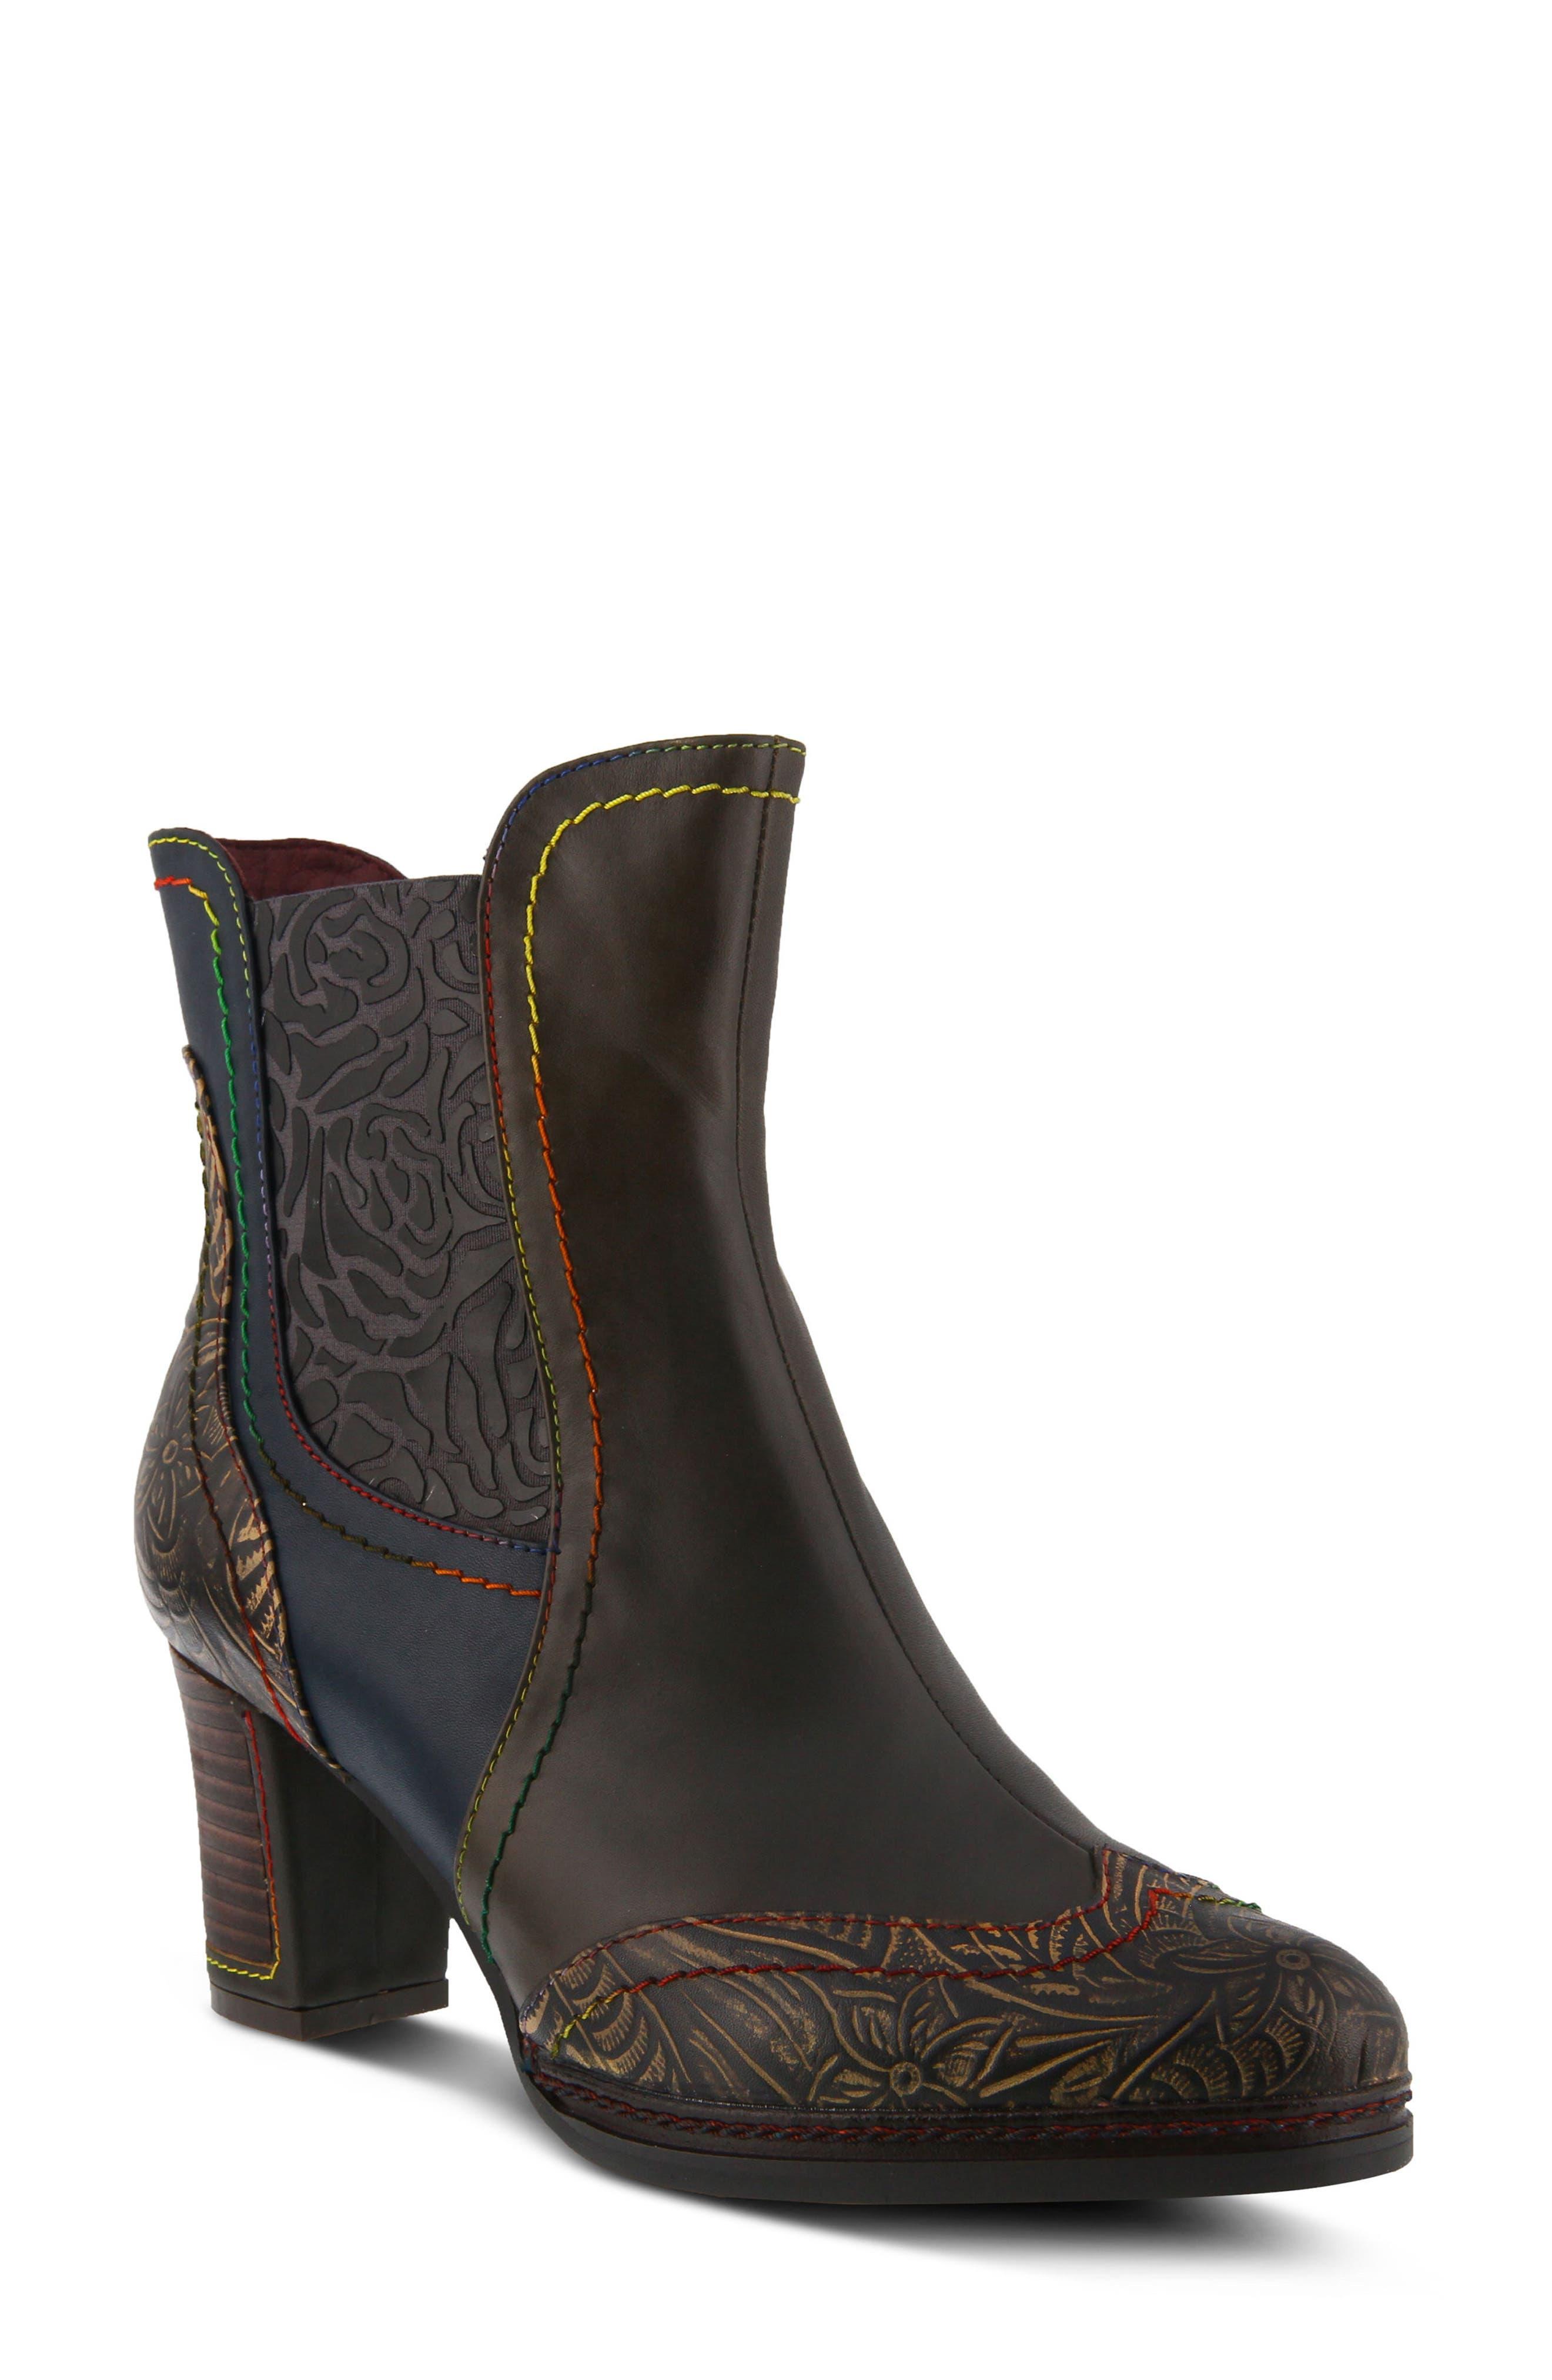 L'Artiste Santana Boot,                         Main,                         color, Olive Green Leather